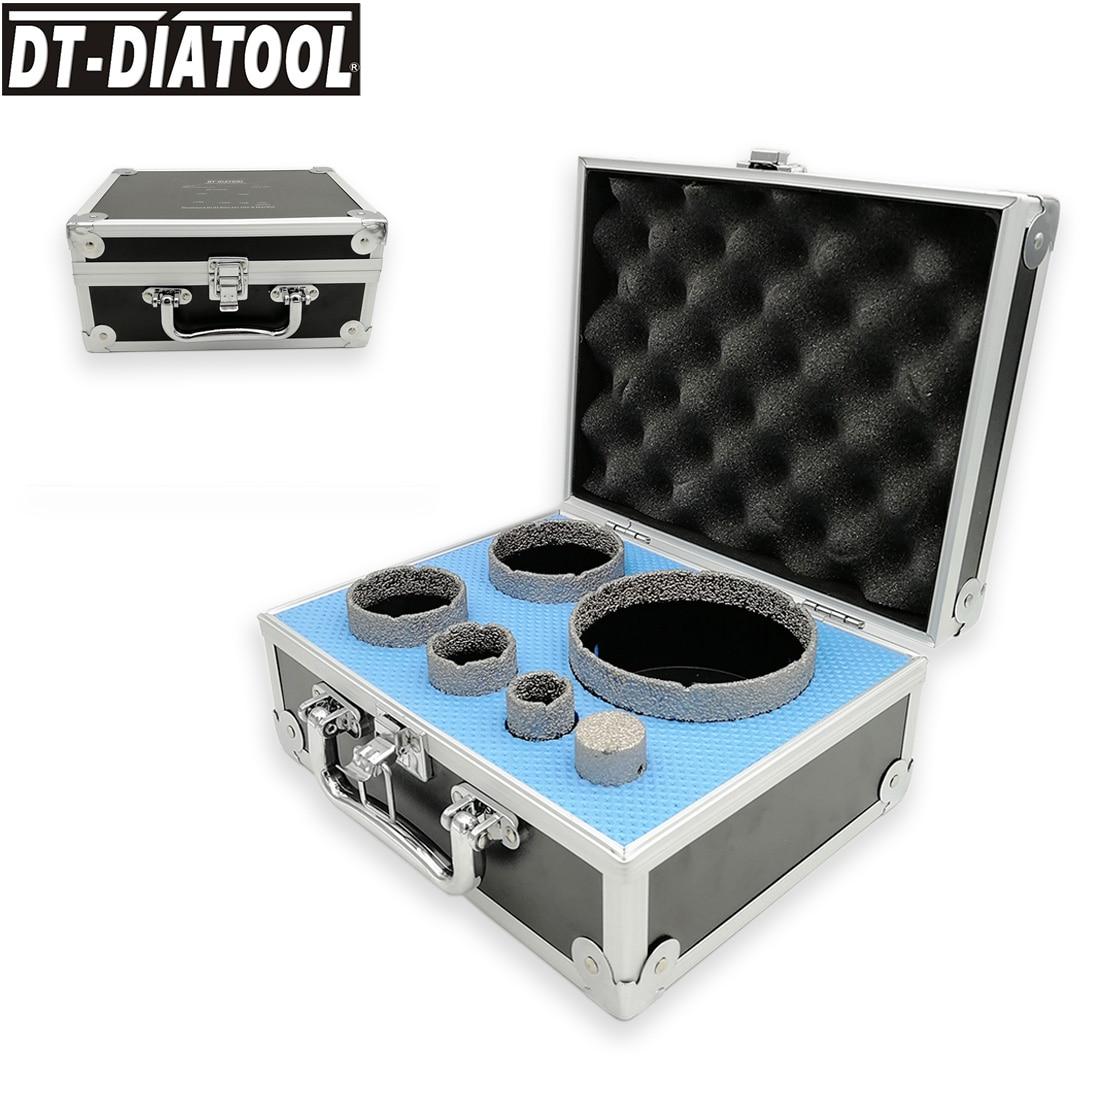 DT-DIATOOL 6pcs/kit Vacuum Brazed Diamond Drilling Core Bits Sets 5/8-11 Thread Hole Saw Mixed size plus 25mm Finger Bits Tile